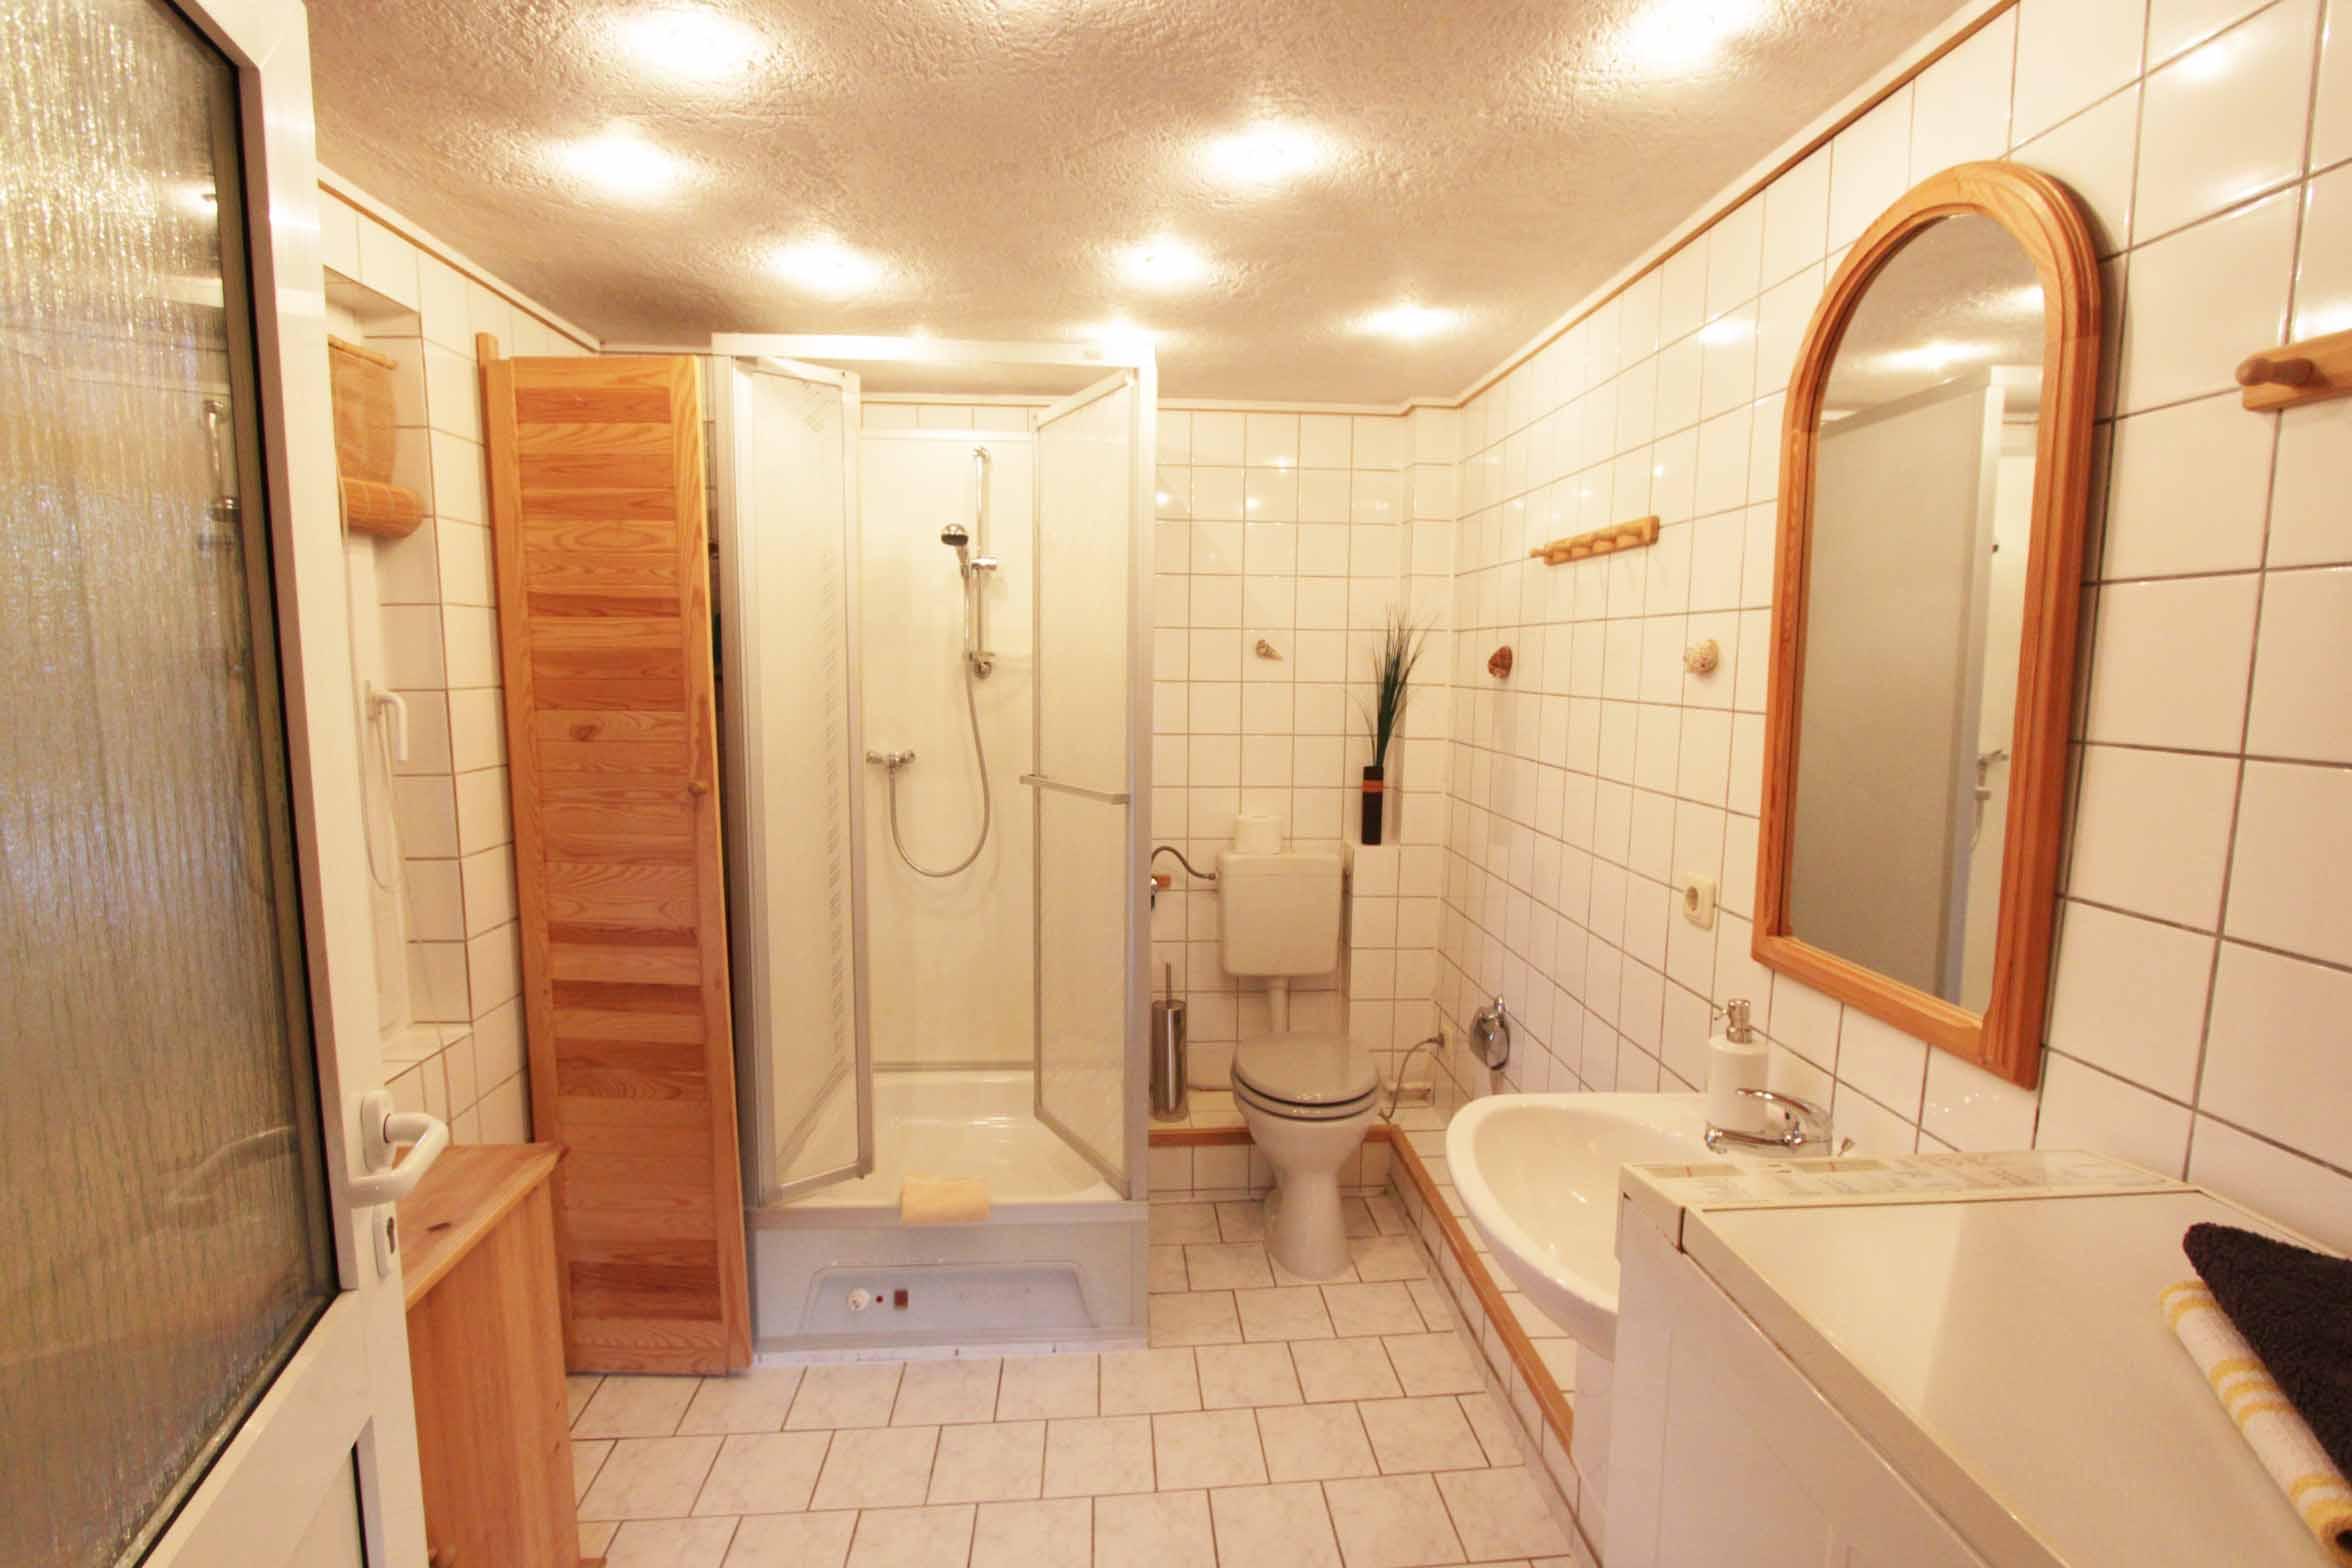 bungalow am rieck 2 zimmer ferienwohnung zempin. Black Bedroom Furniture Sets. Home Design Ideas